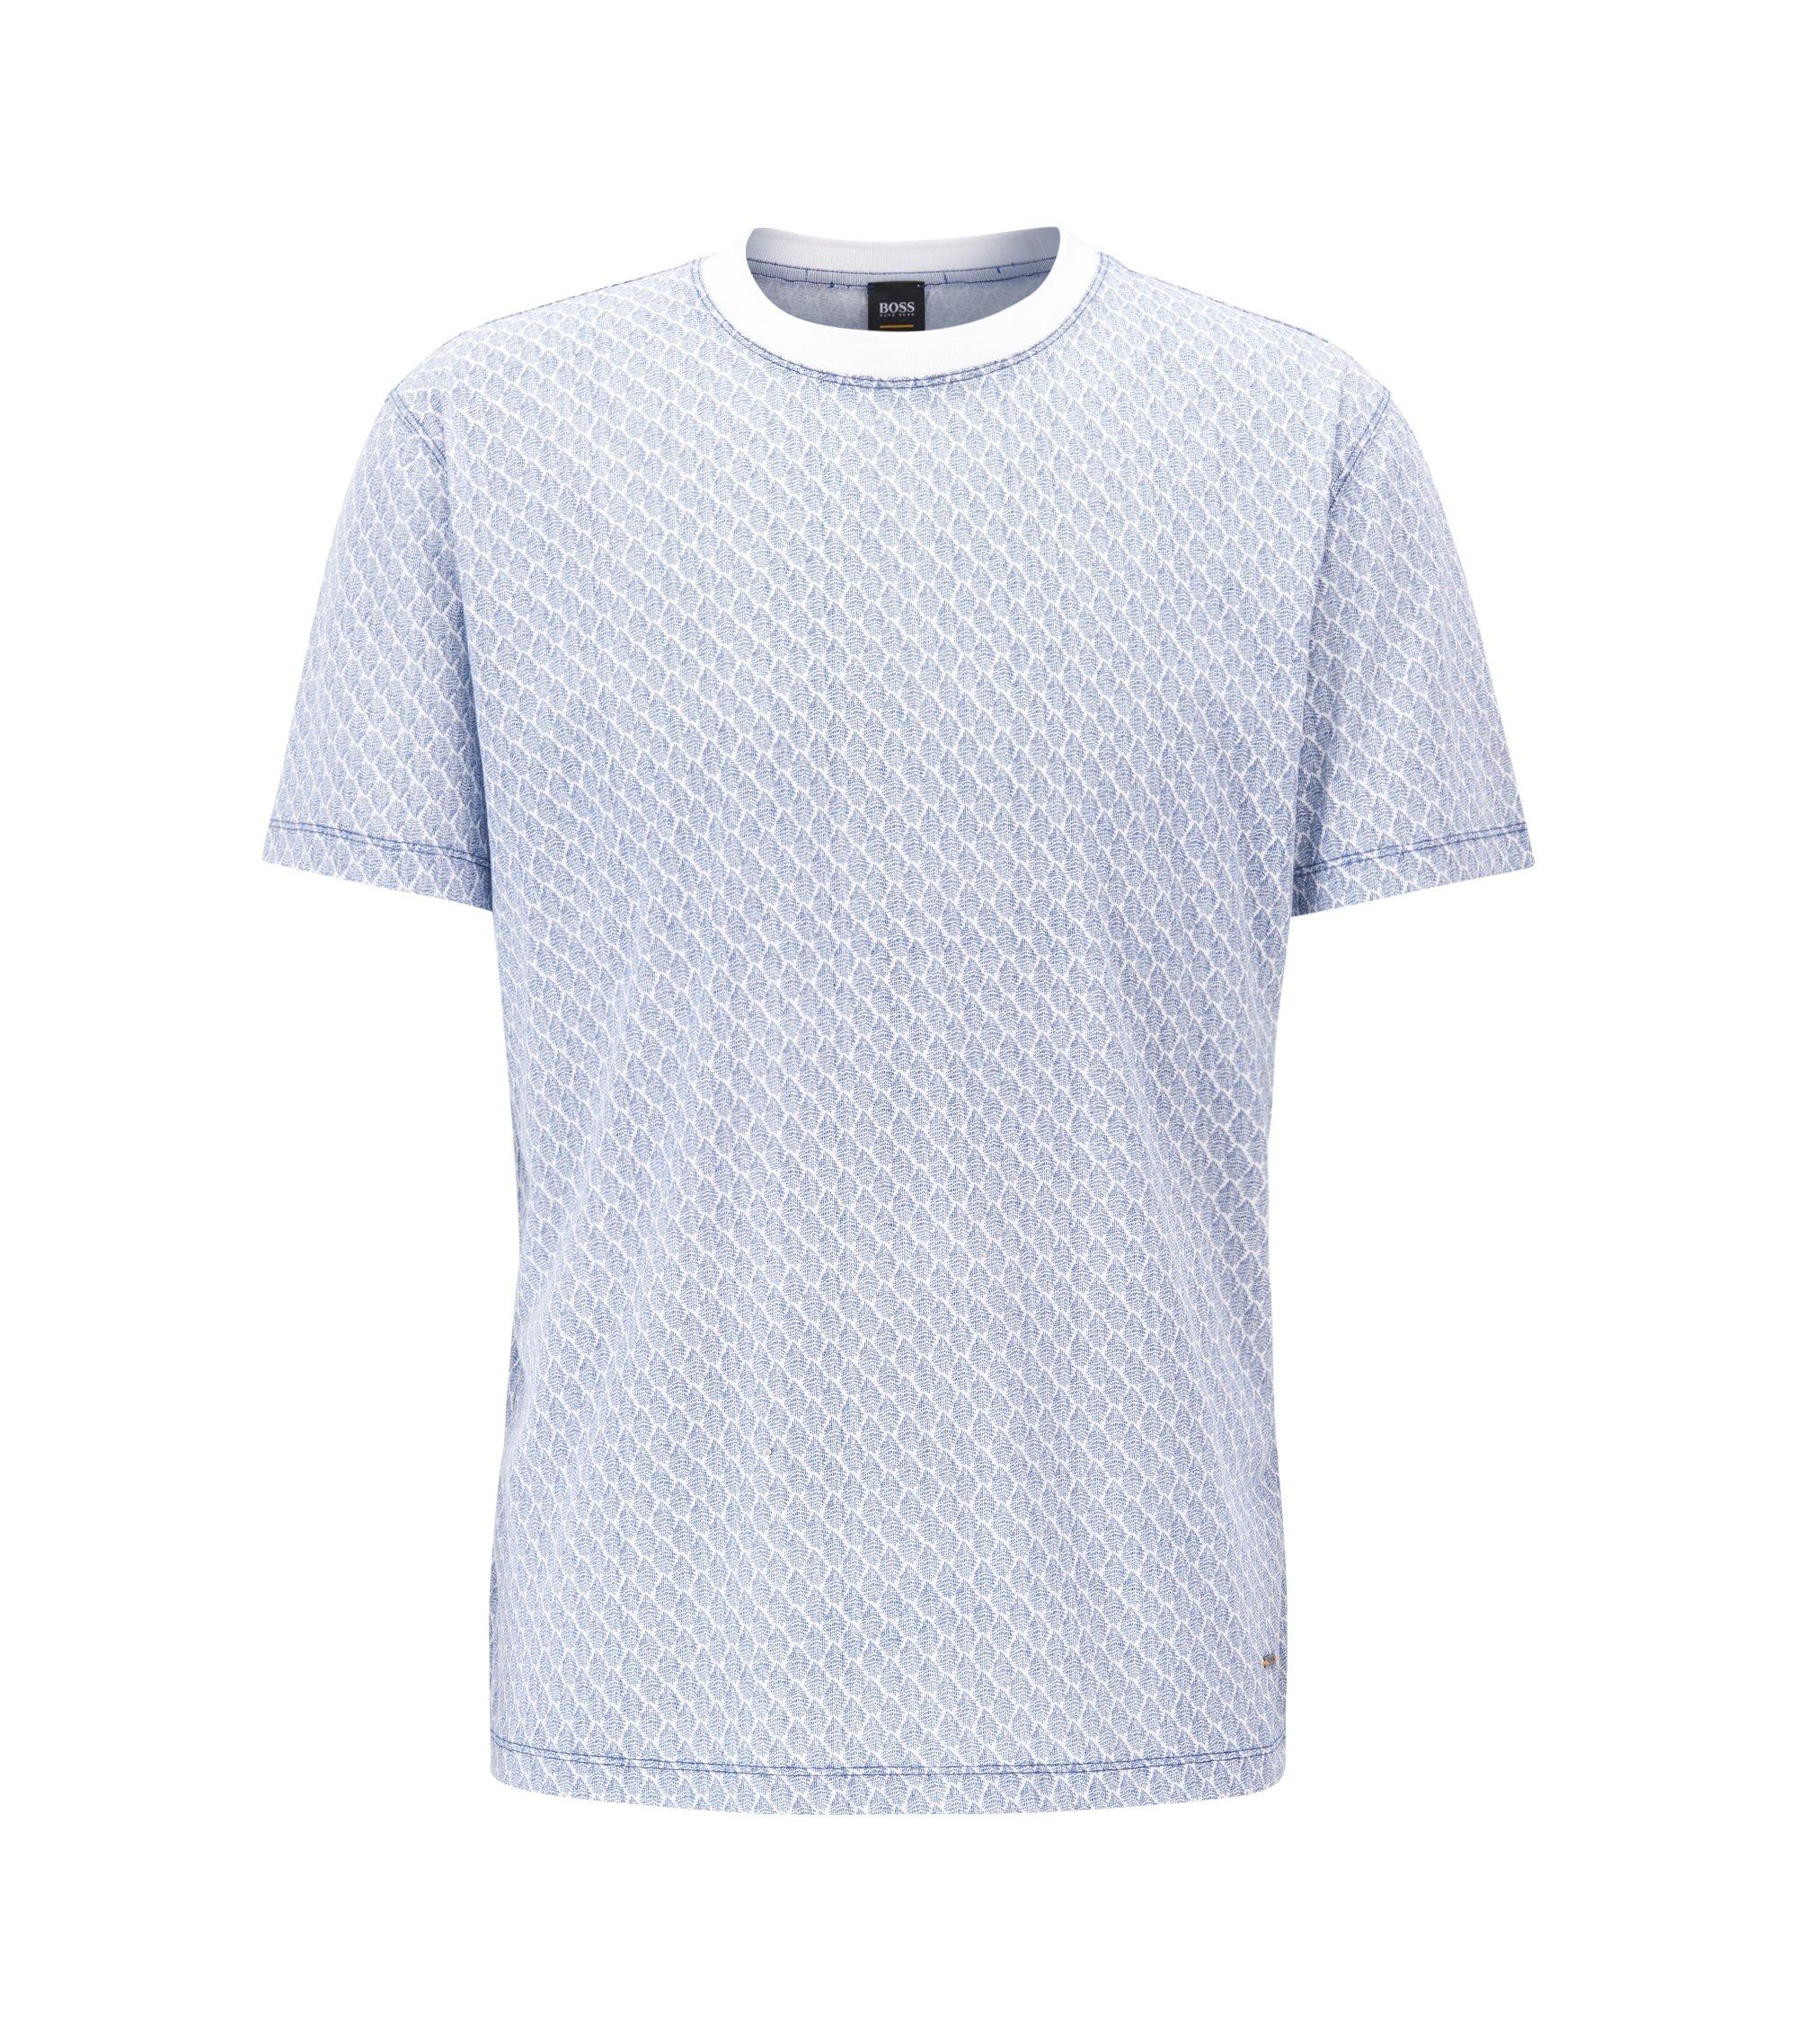 Relaxed-Fit T-Shirt aus gemustertem Baumwoll-Jersey, Hellblau